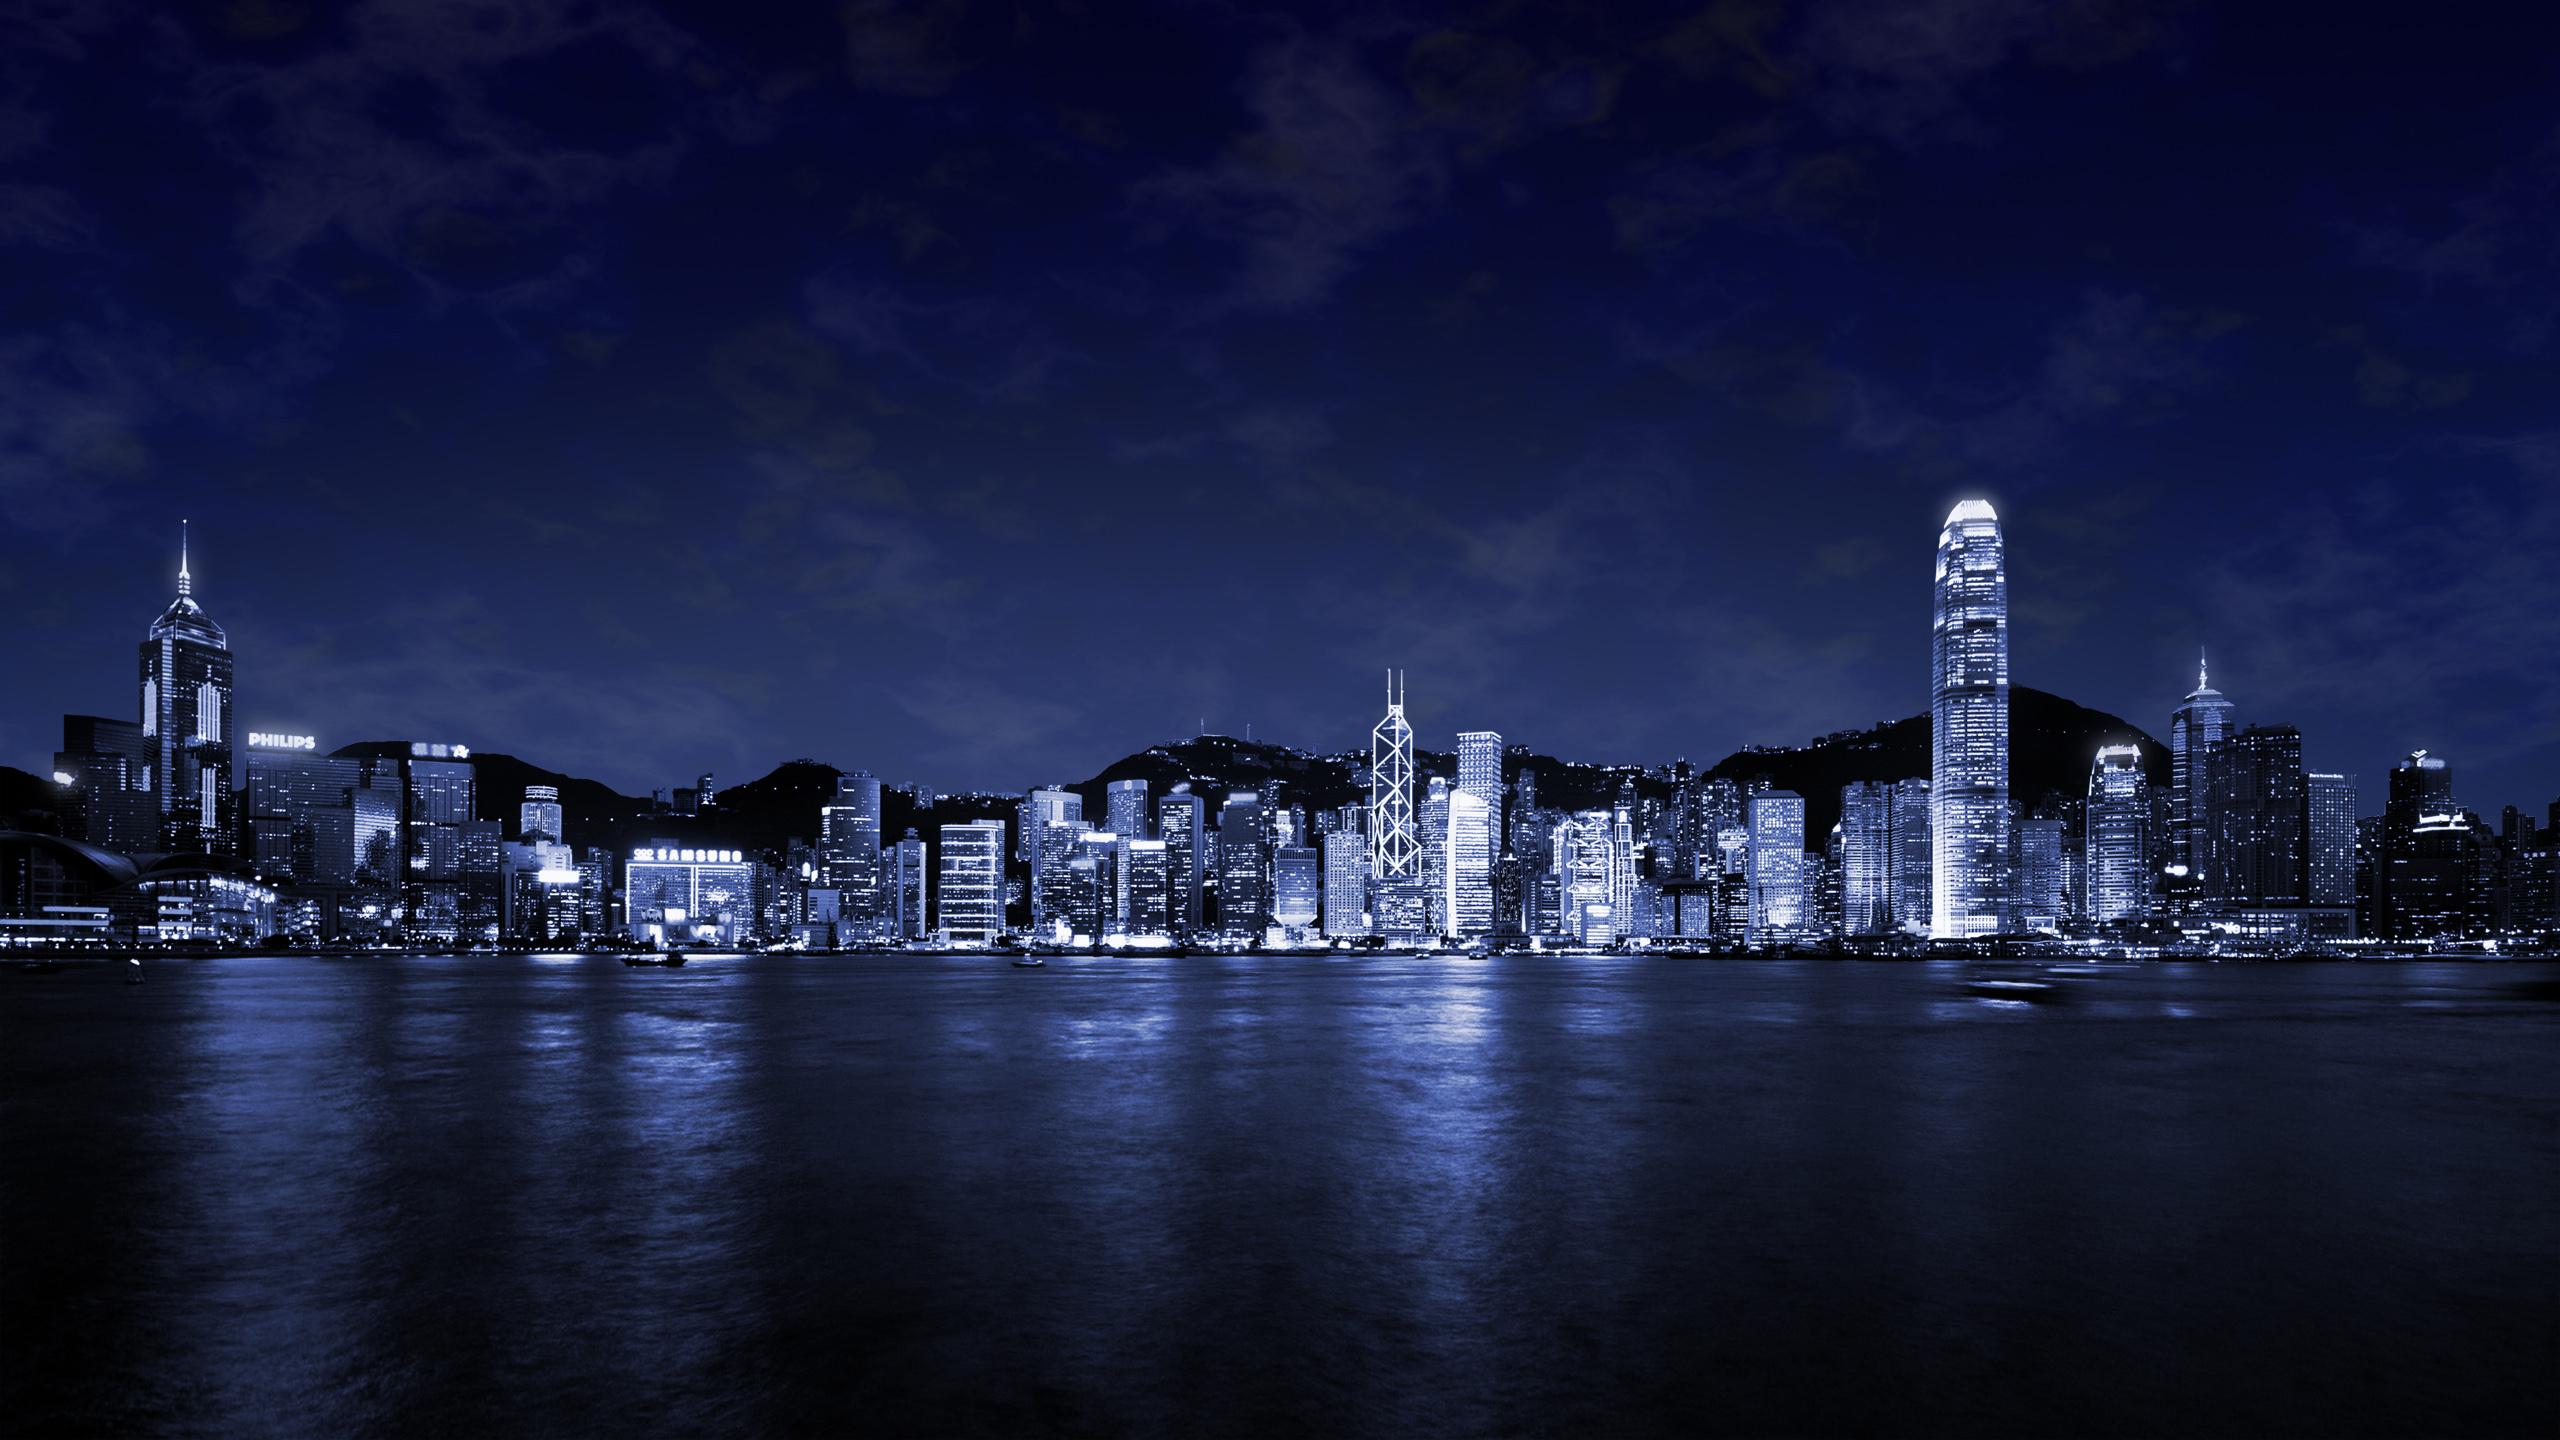 City At Night wallpaper - 1058862